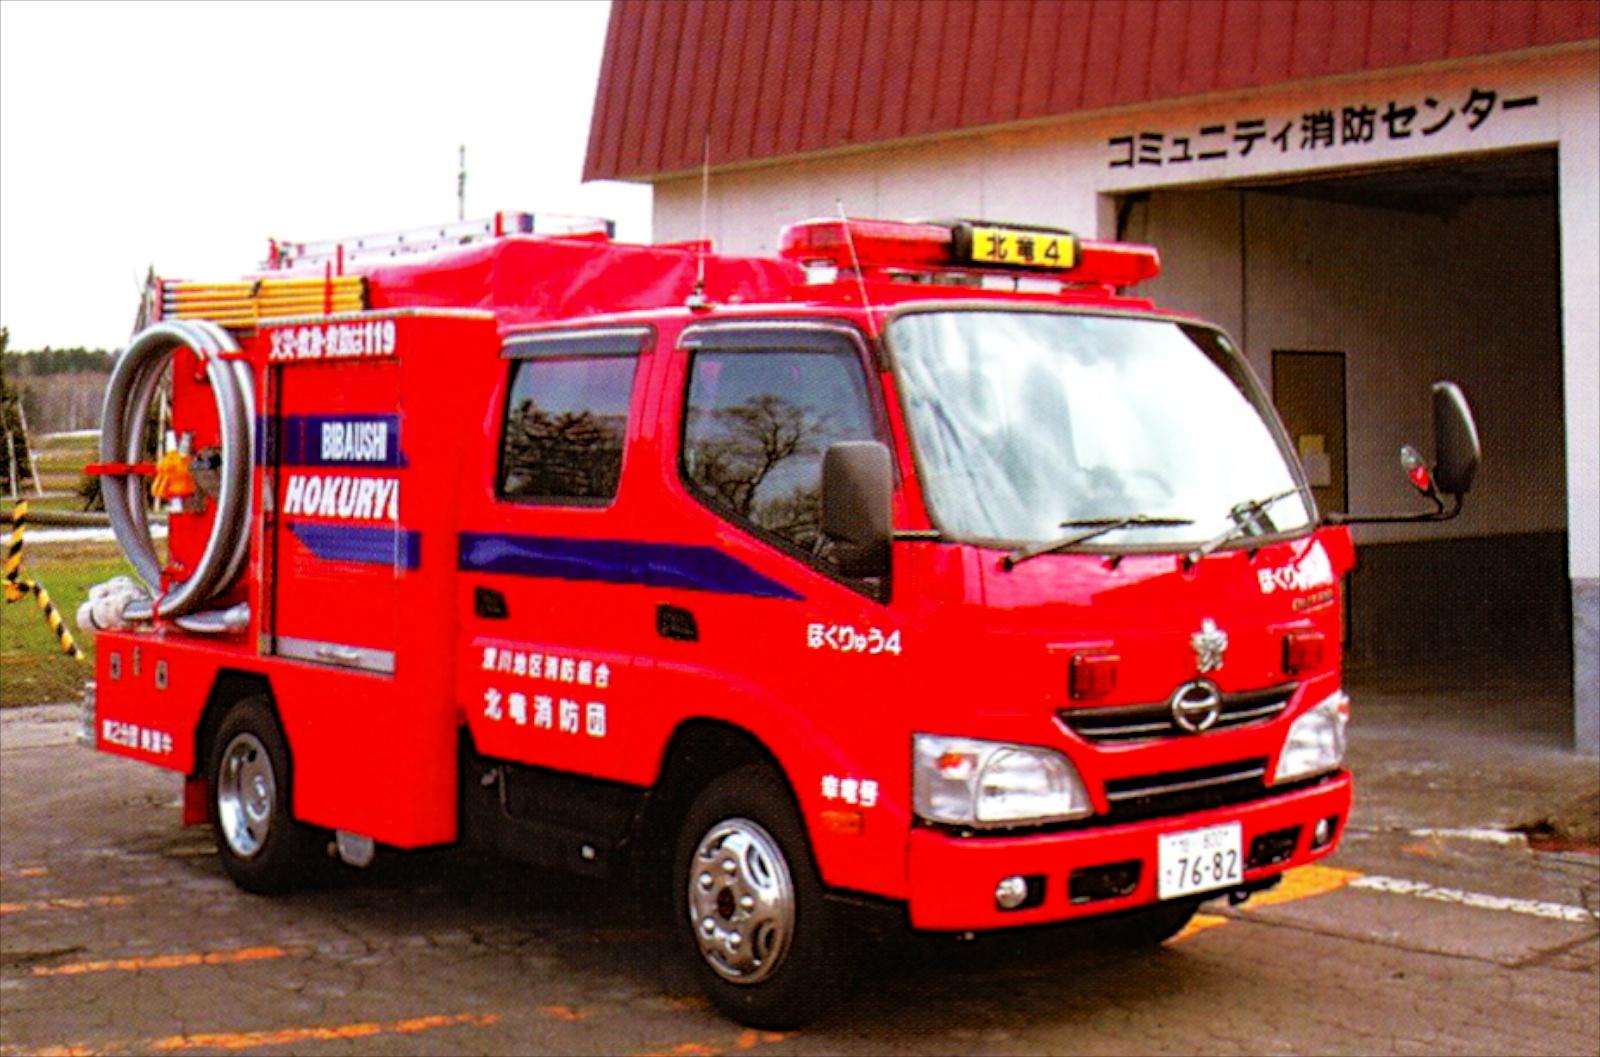 Photo: 小型動力ポンプ付積載車10人乗り「幸竜号」 小型動力ポンプ積載車